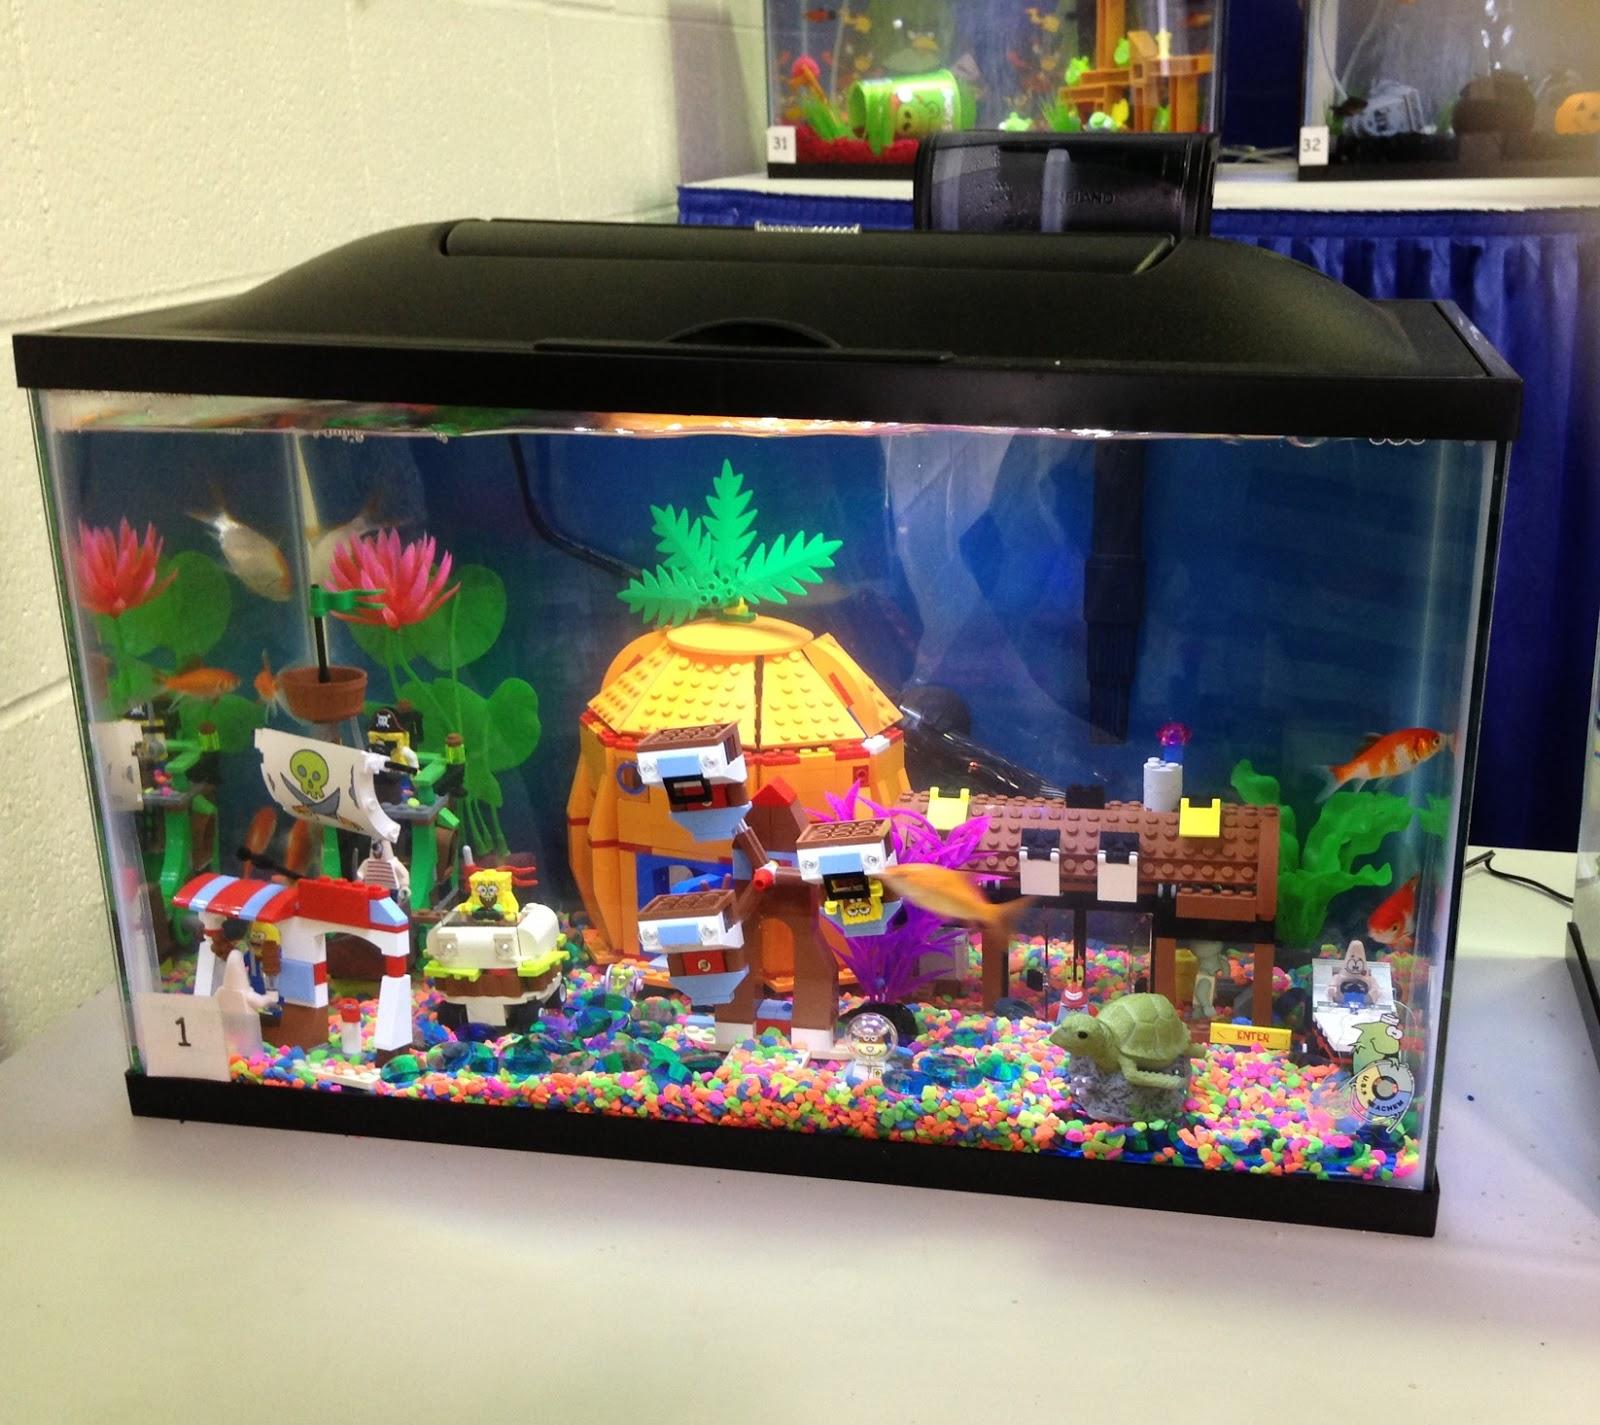 Fish tank decorations spongebob recap america s family for Walmart fish tank decorations